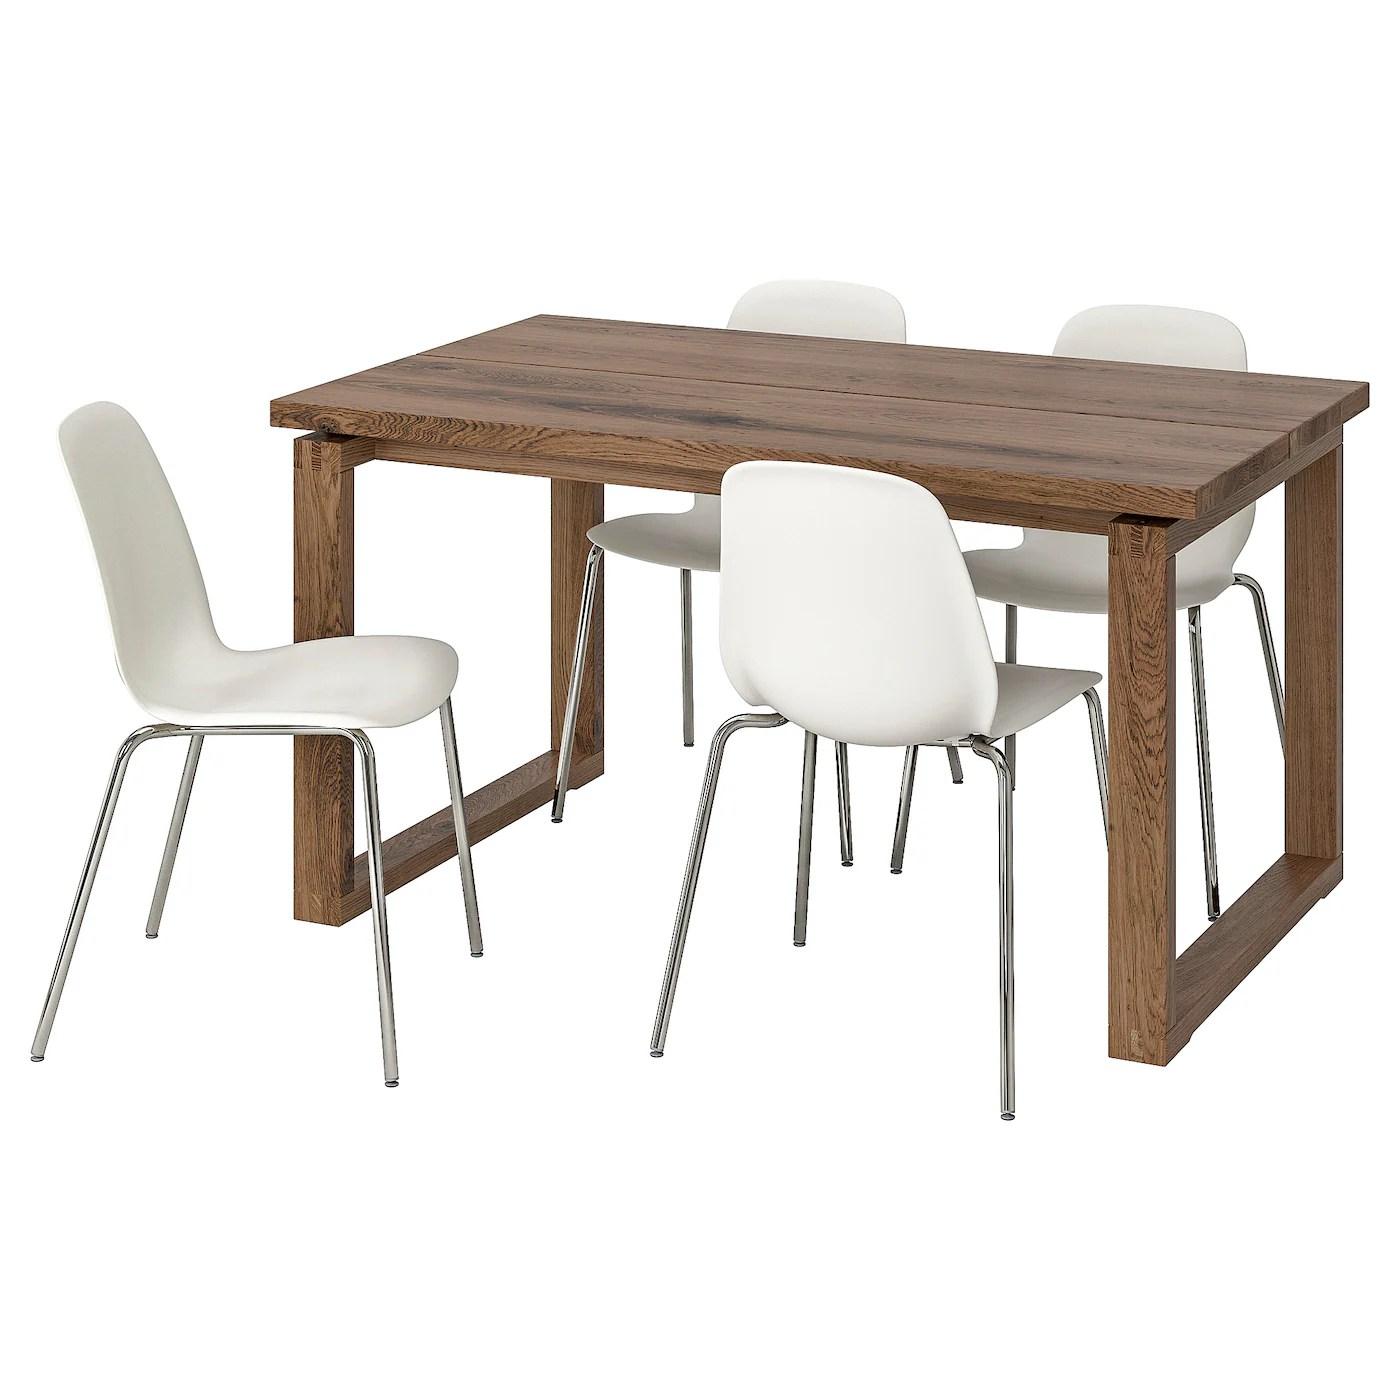 morbylanga leifarne table and 4 chairs brown white 140x85 cm